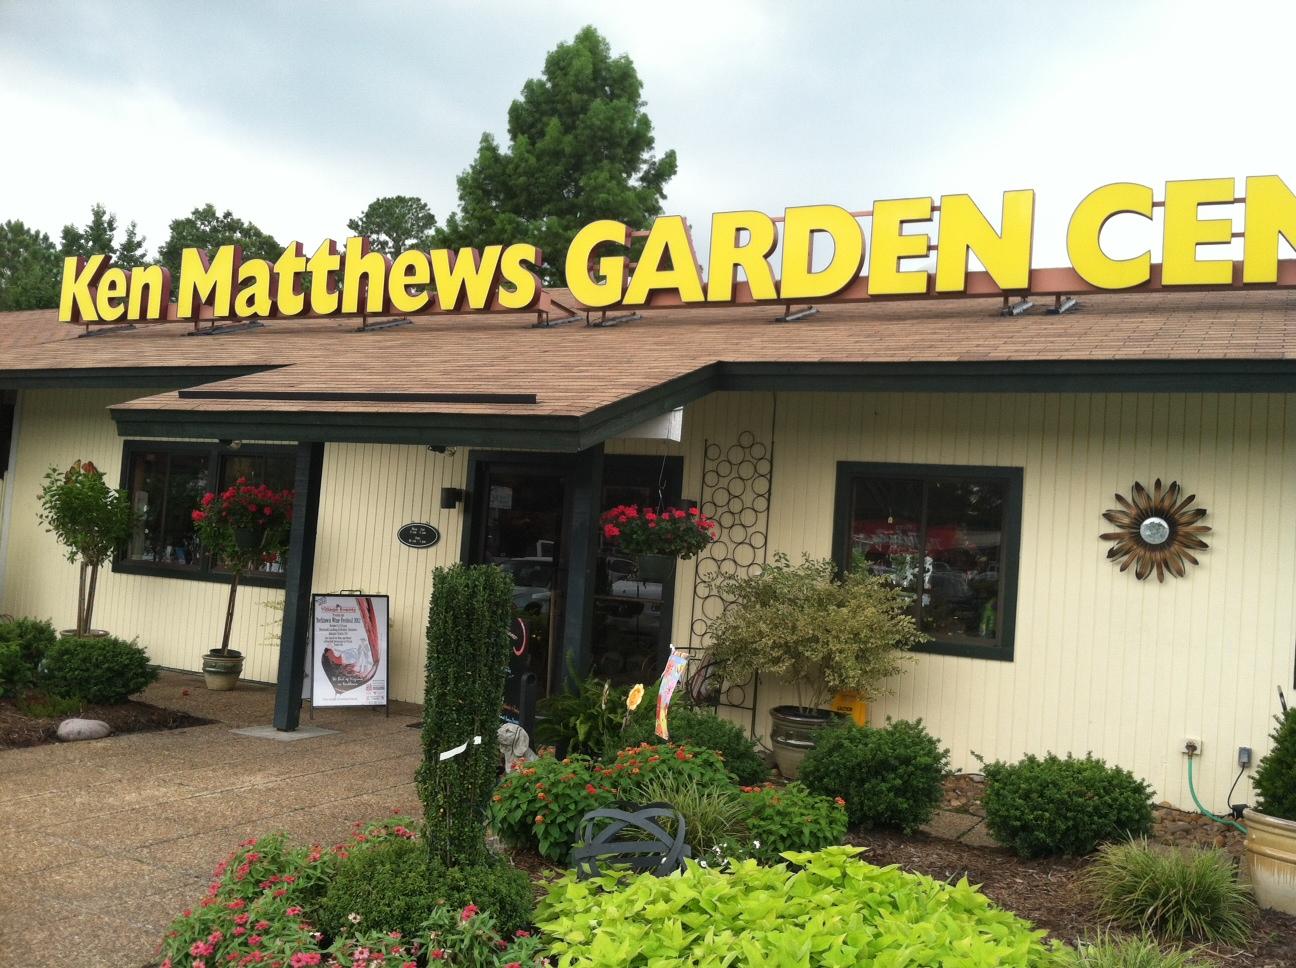 pawstcards from hampton roads ken matthews garden center dog days yorktown va